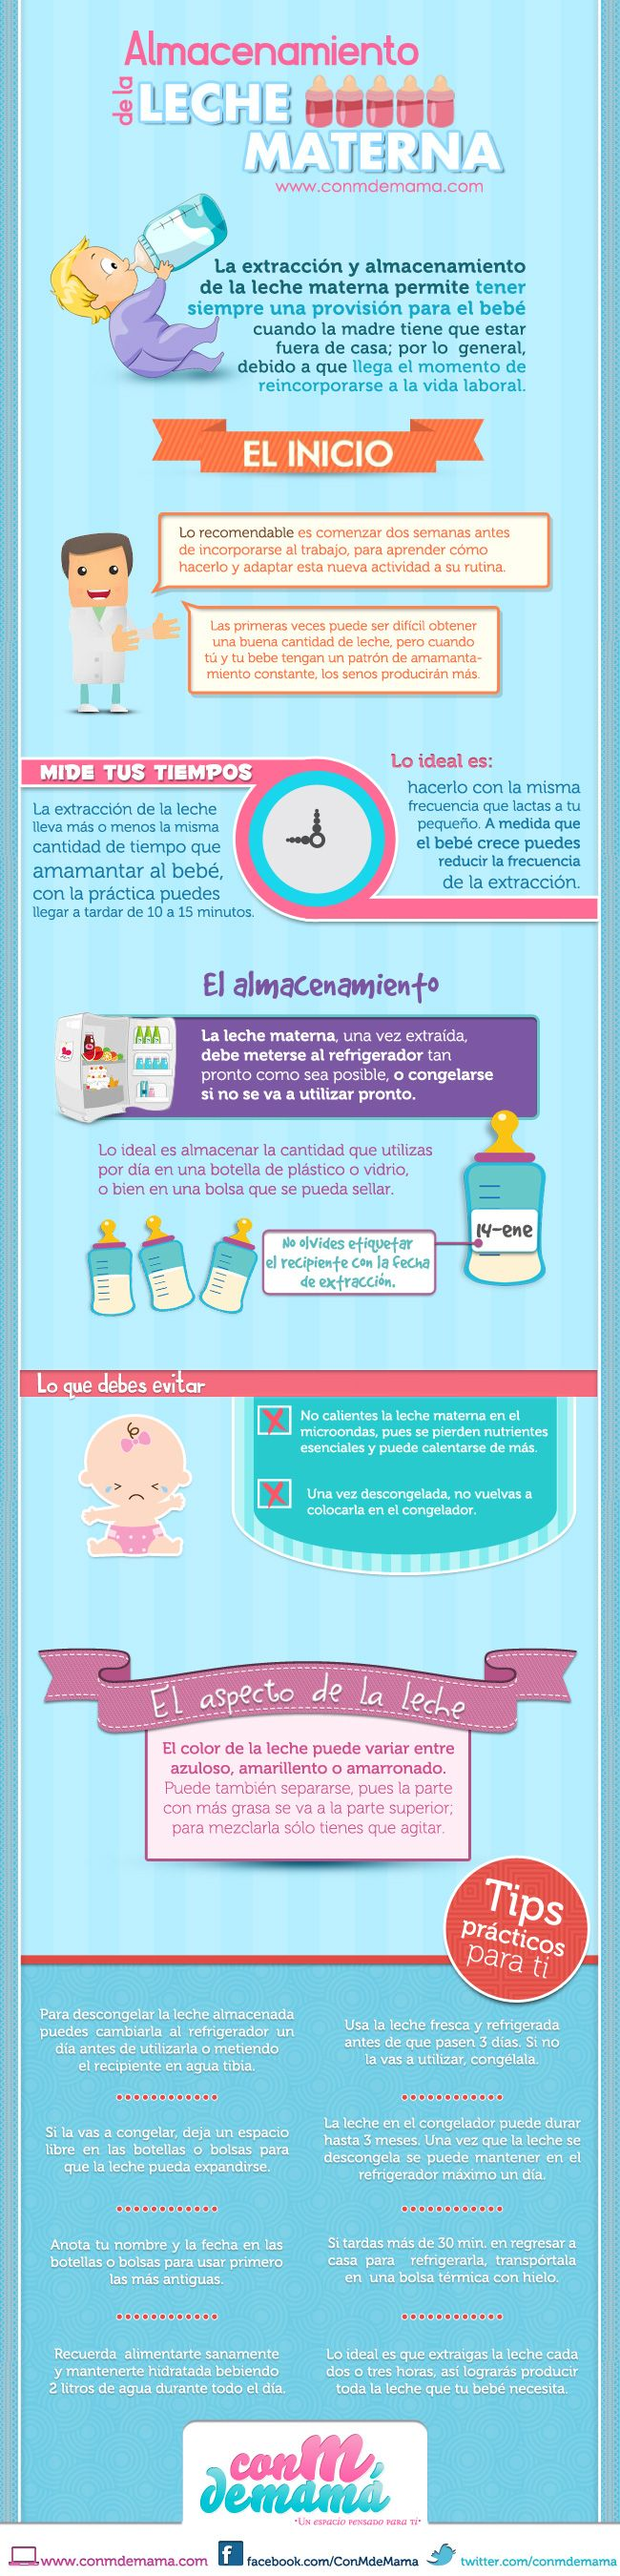 Aprende cómo almacenar correctamente la leche materna #Infografia.